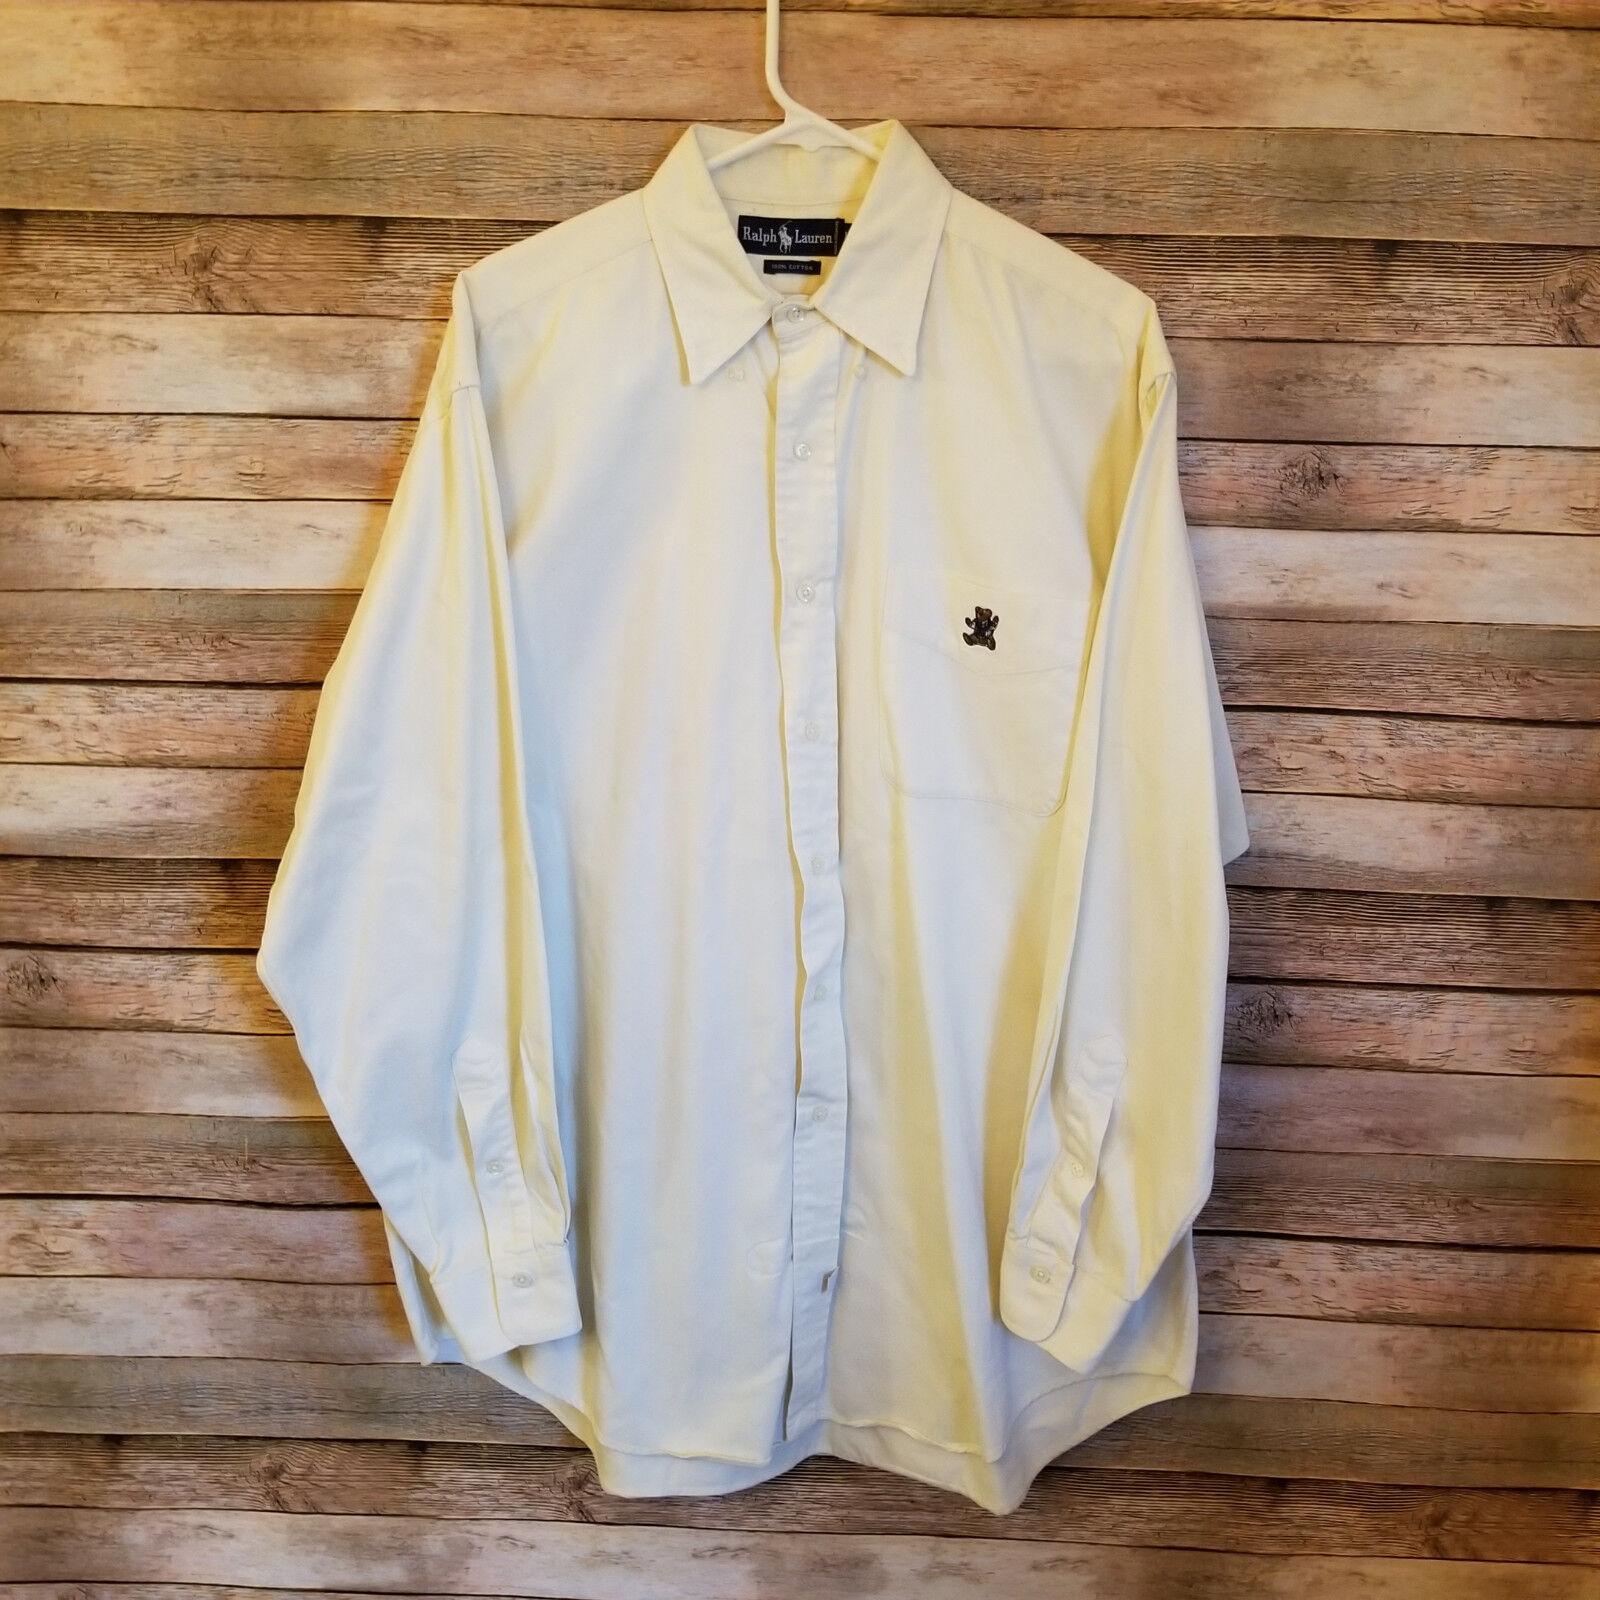 Vintage Ralph Lauren Embroidered Teddy Bear Men's Button Down Shirt Large EUC